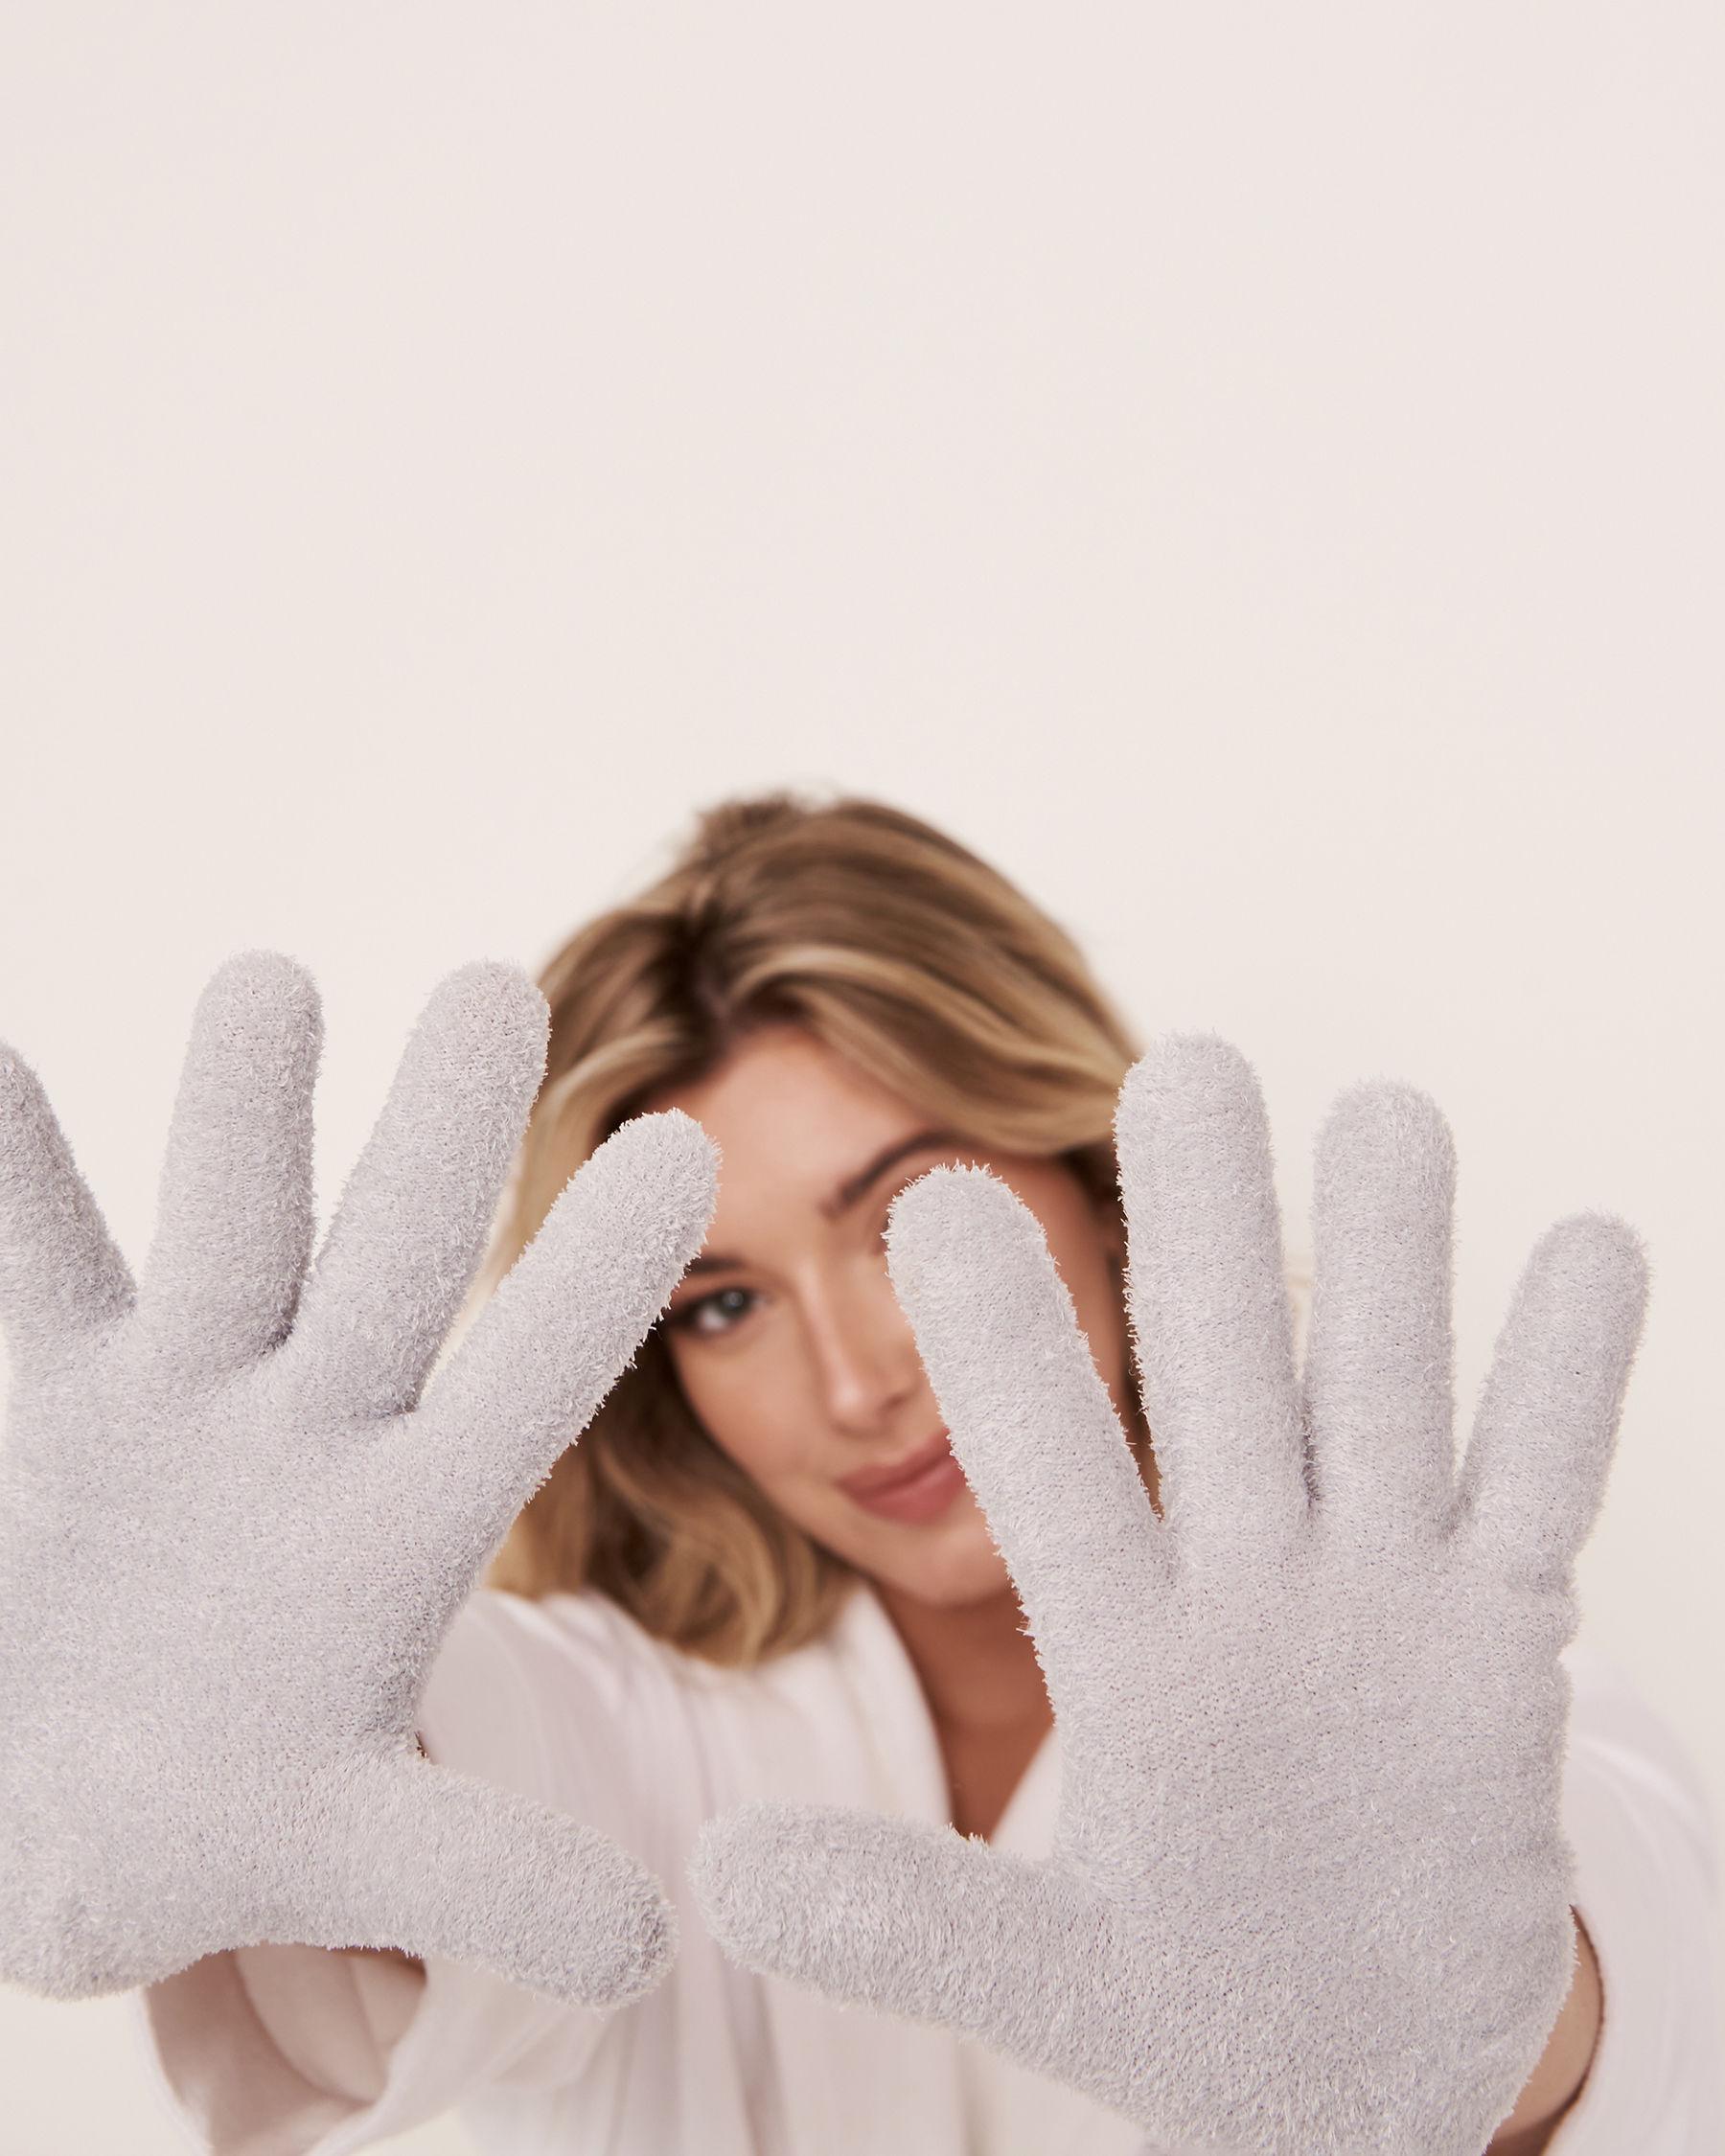 LA VIE EN ROSE Lavender Moisturizing Gel Gloves Grey 431-527-1-00 - View2